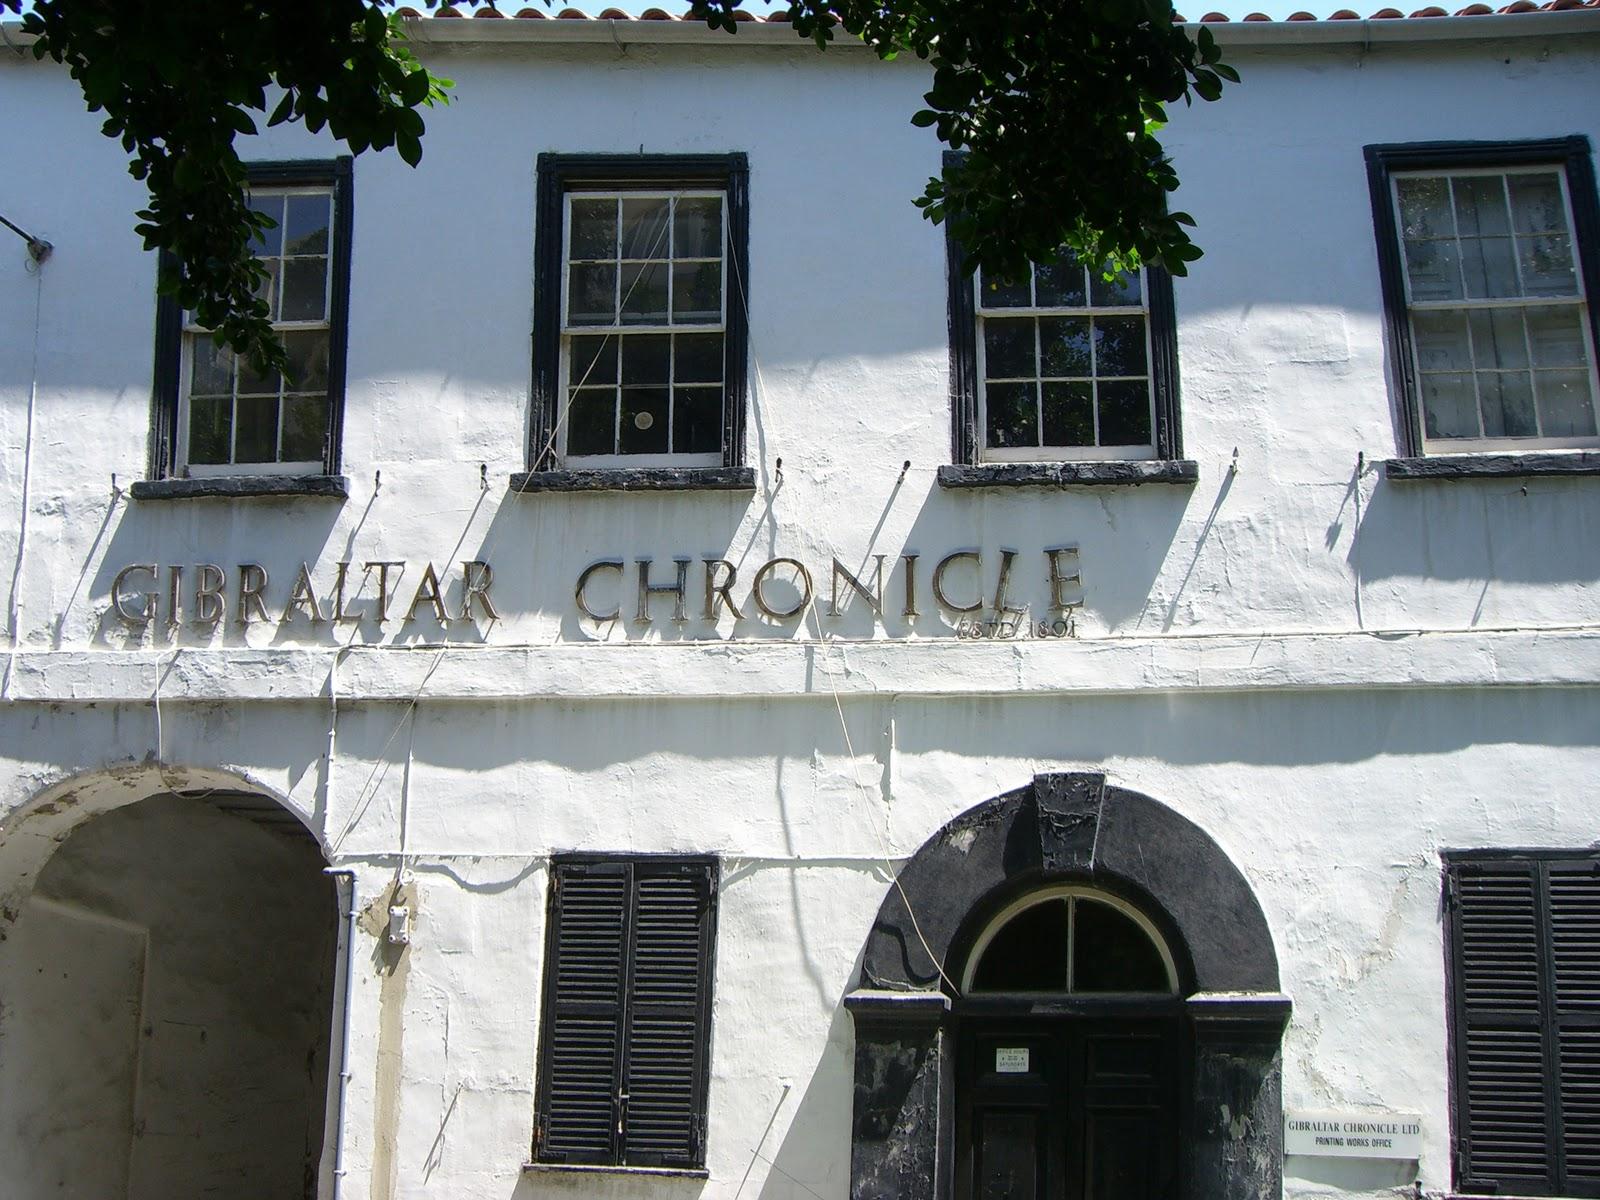 http://2.bp.blogspot.com/-YG77Y-87snk/Tp6avU4pbCI/AAAAAAAAAfY/yMlSvvCkkCY/s1600/Gibraltar_Chronicle_printers.jpg